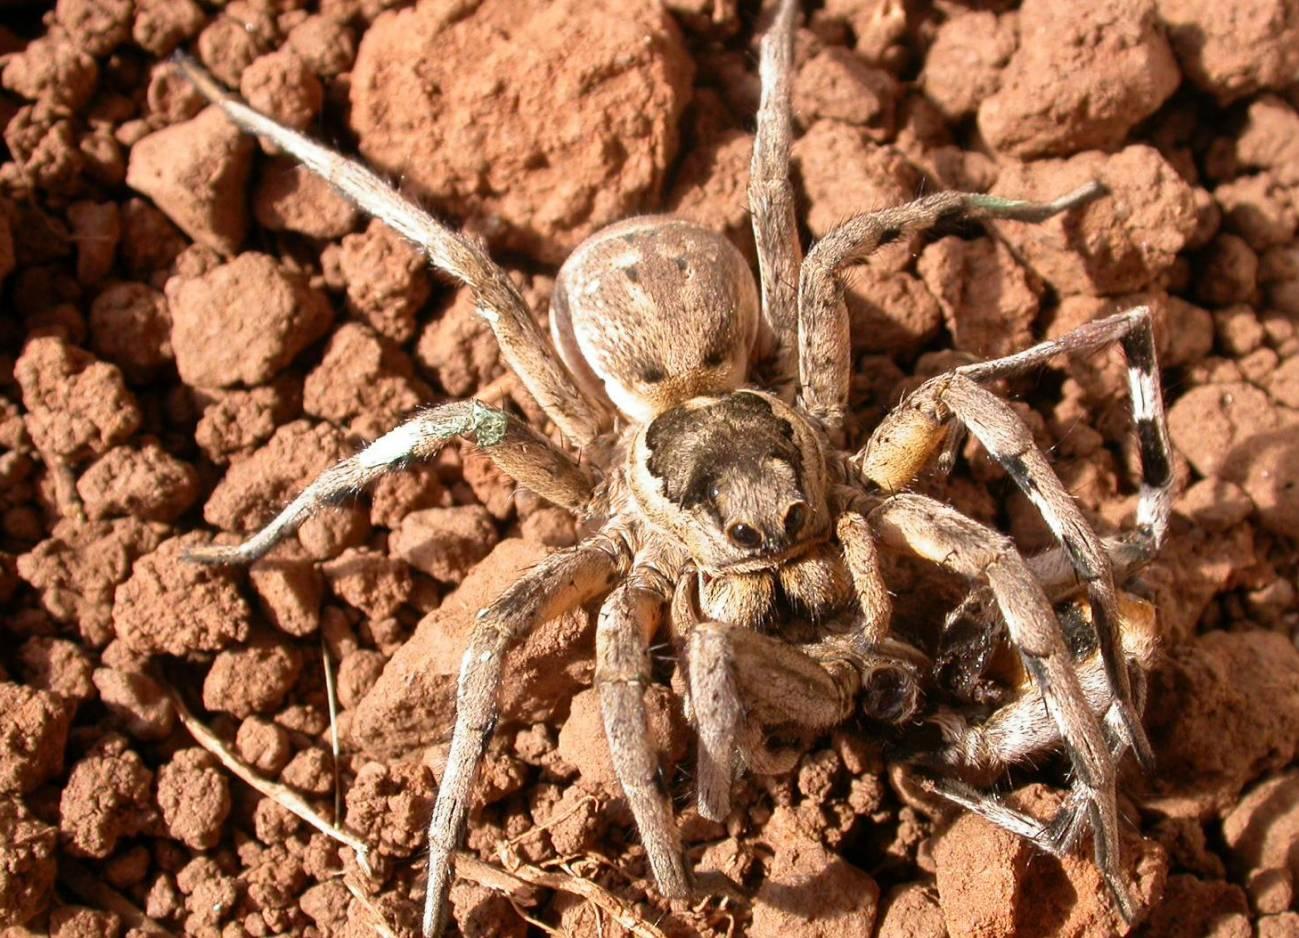 An image of a Mediterranean tarantula, Lycosa hispanica / Eva de Mas